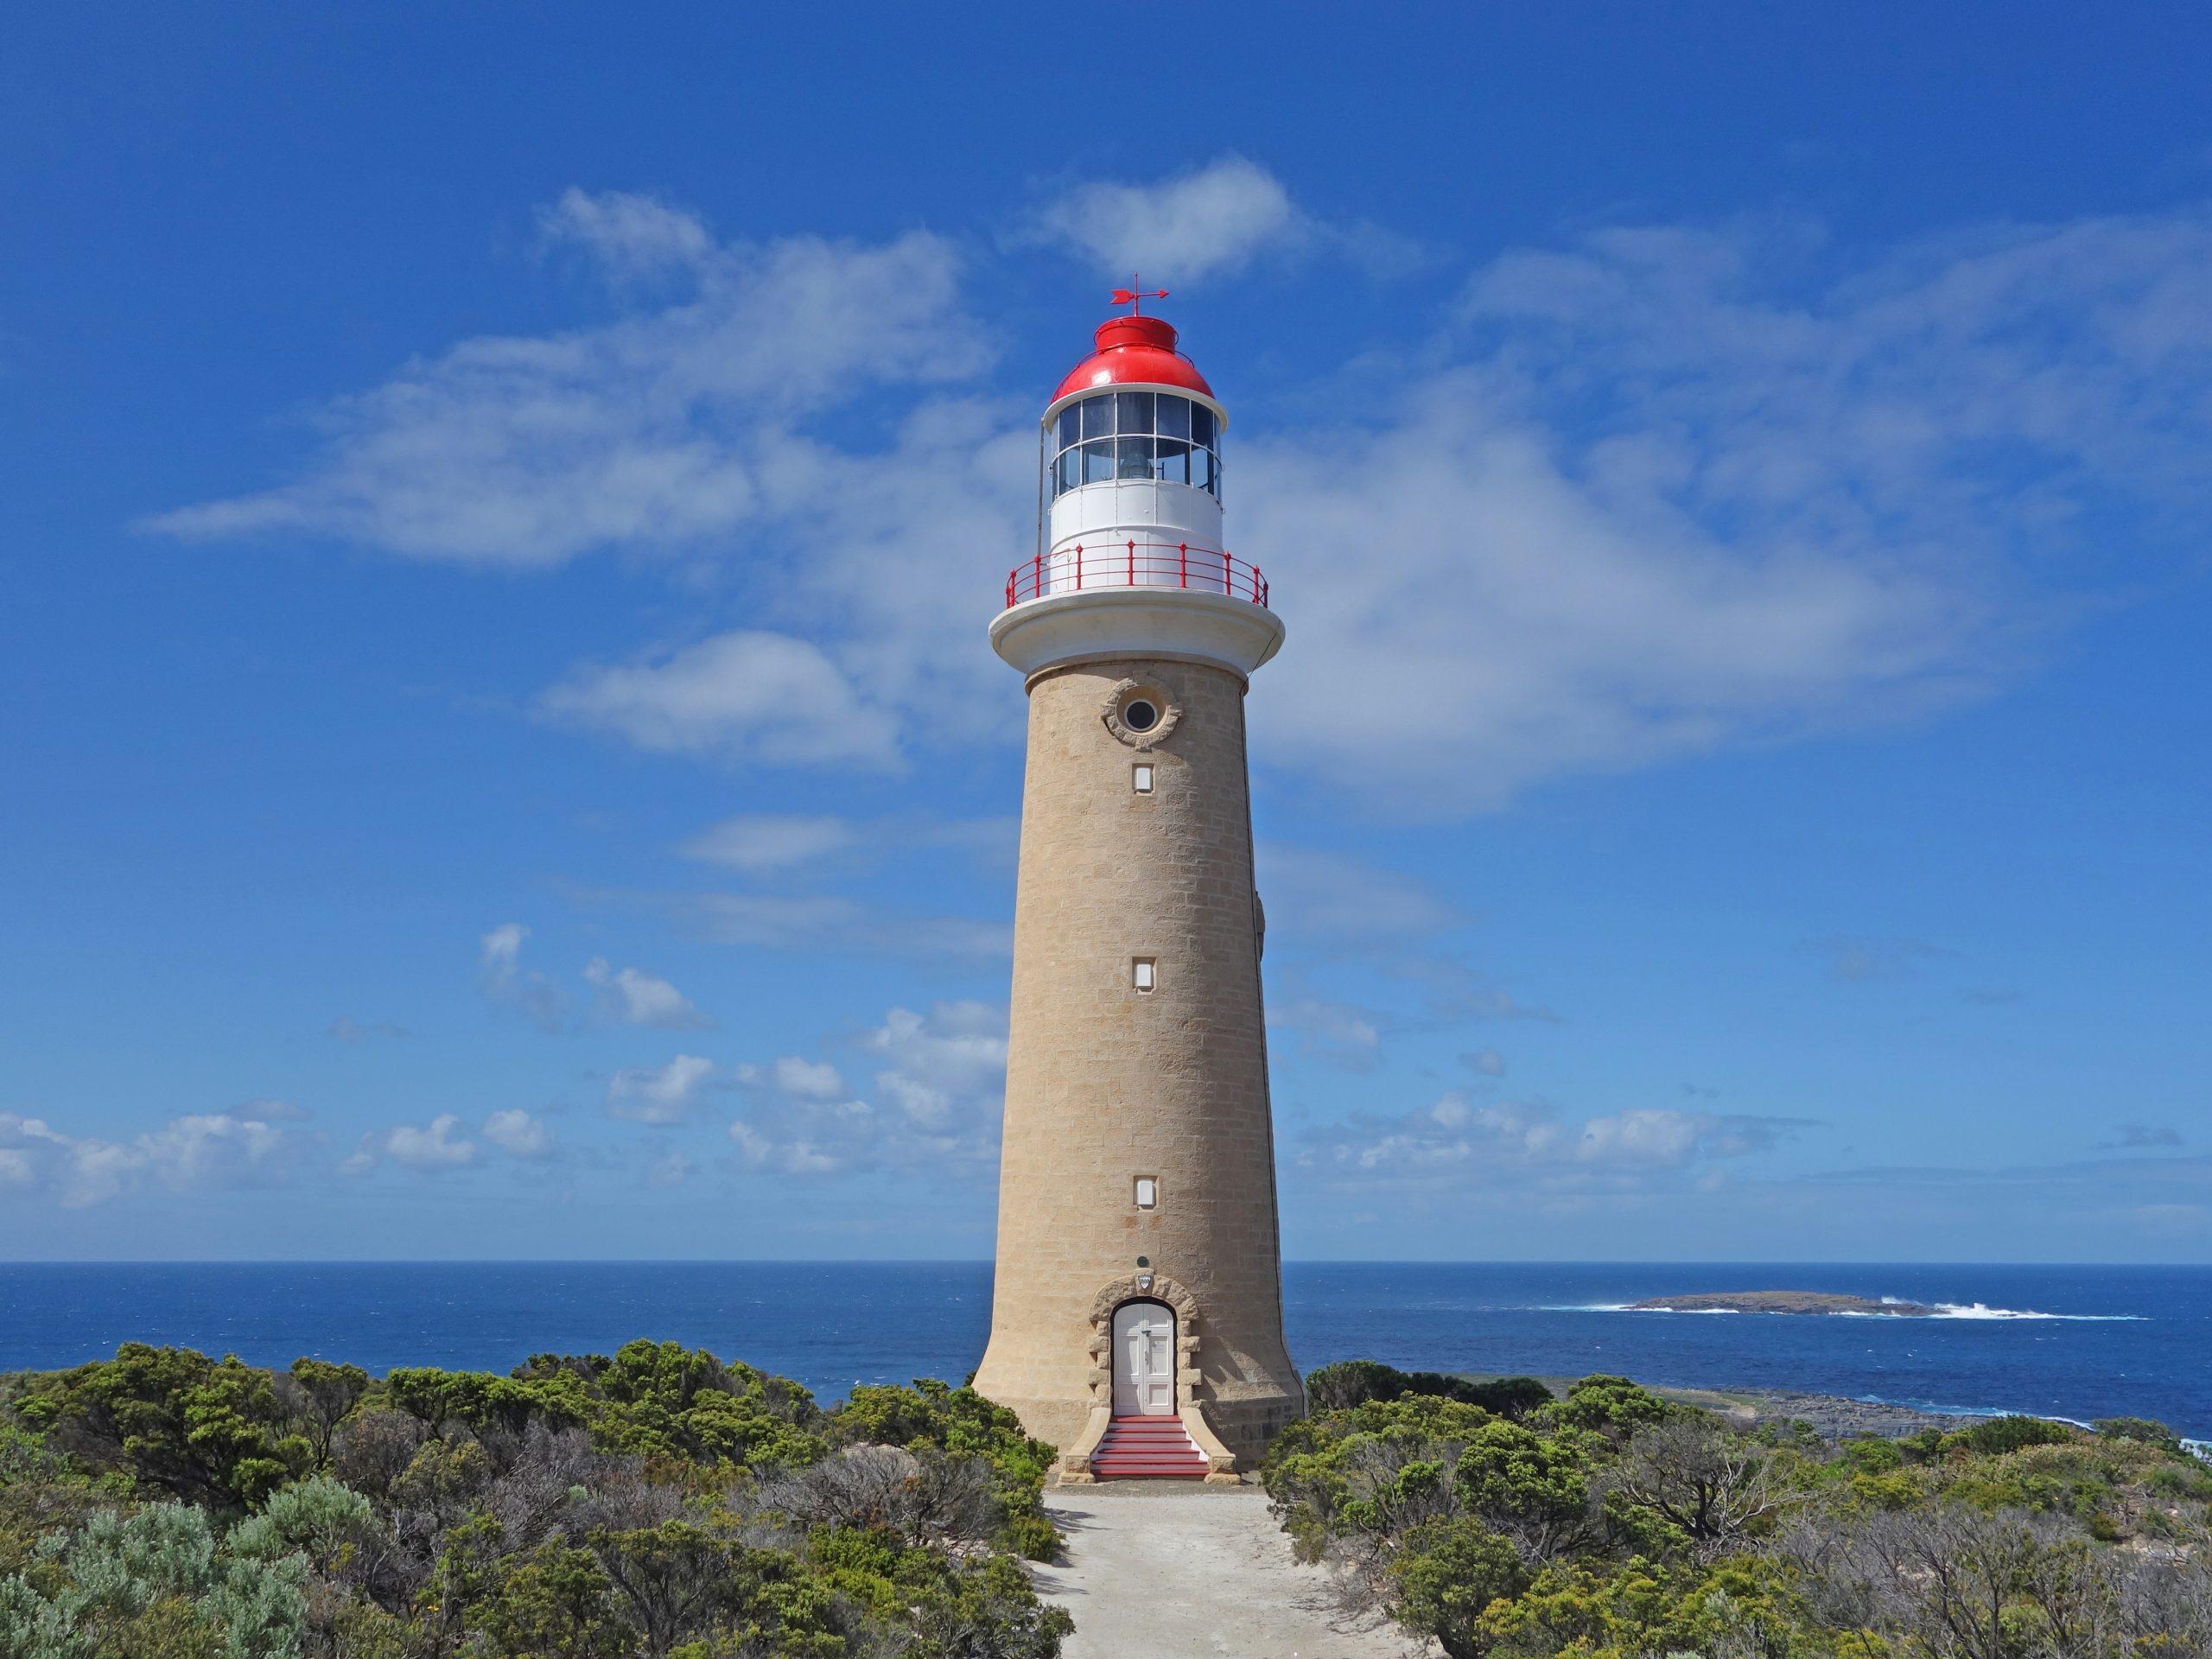 Radreise Australien 2016 - Kangaroo Island - Leuchtturm am Cape du Couedic